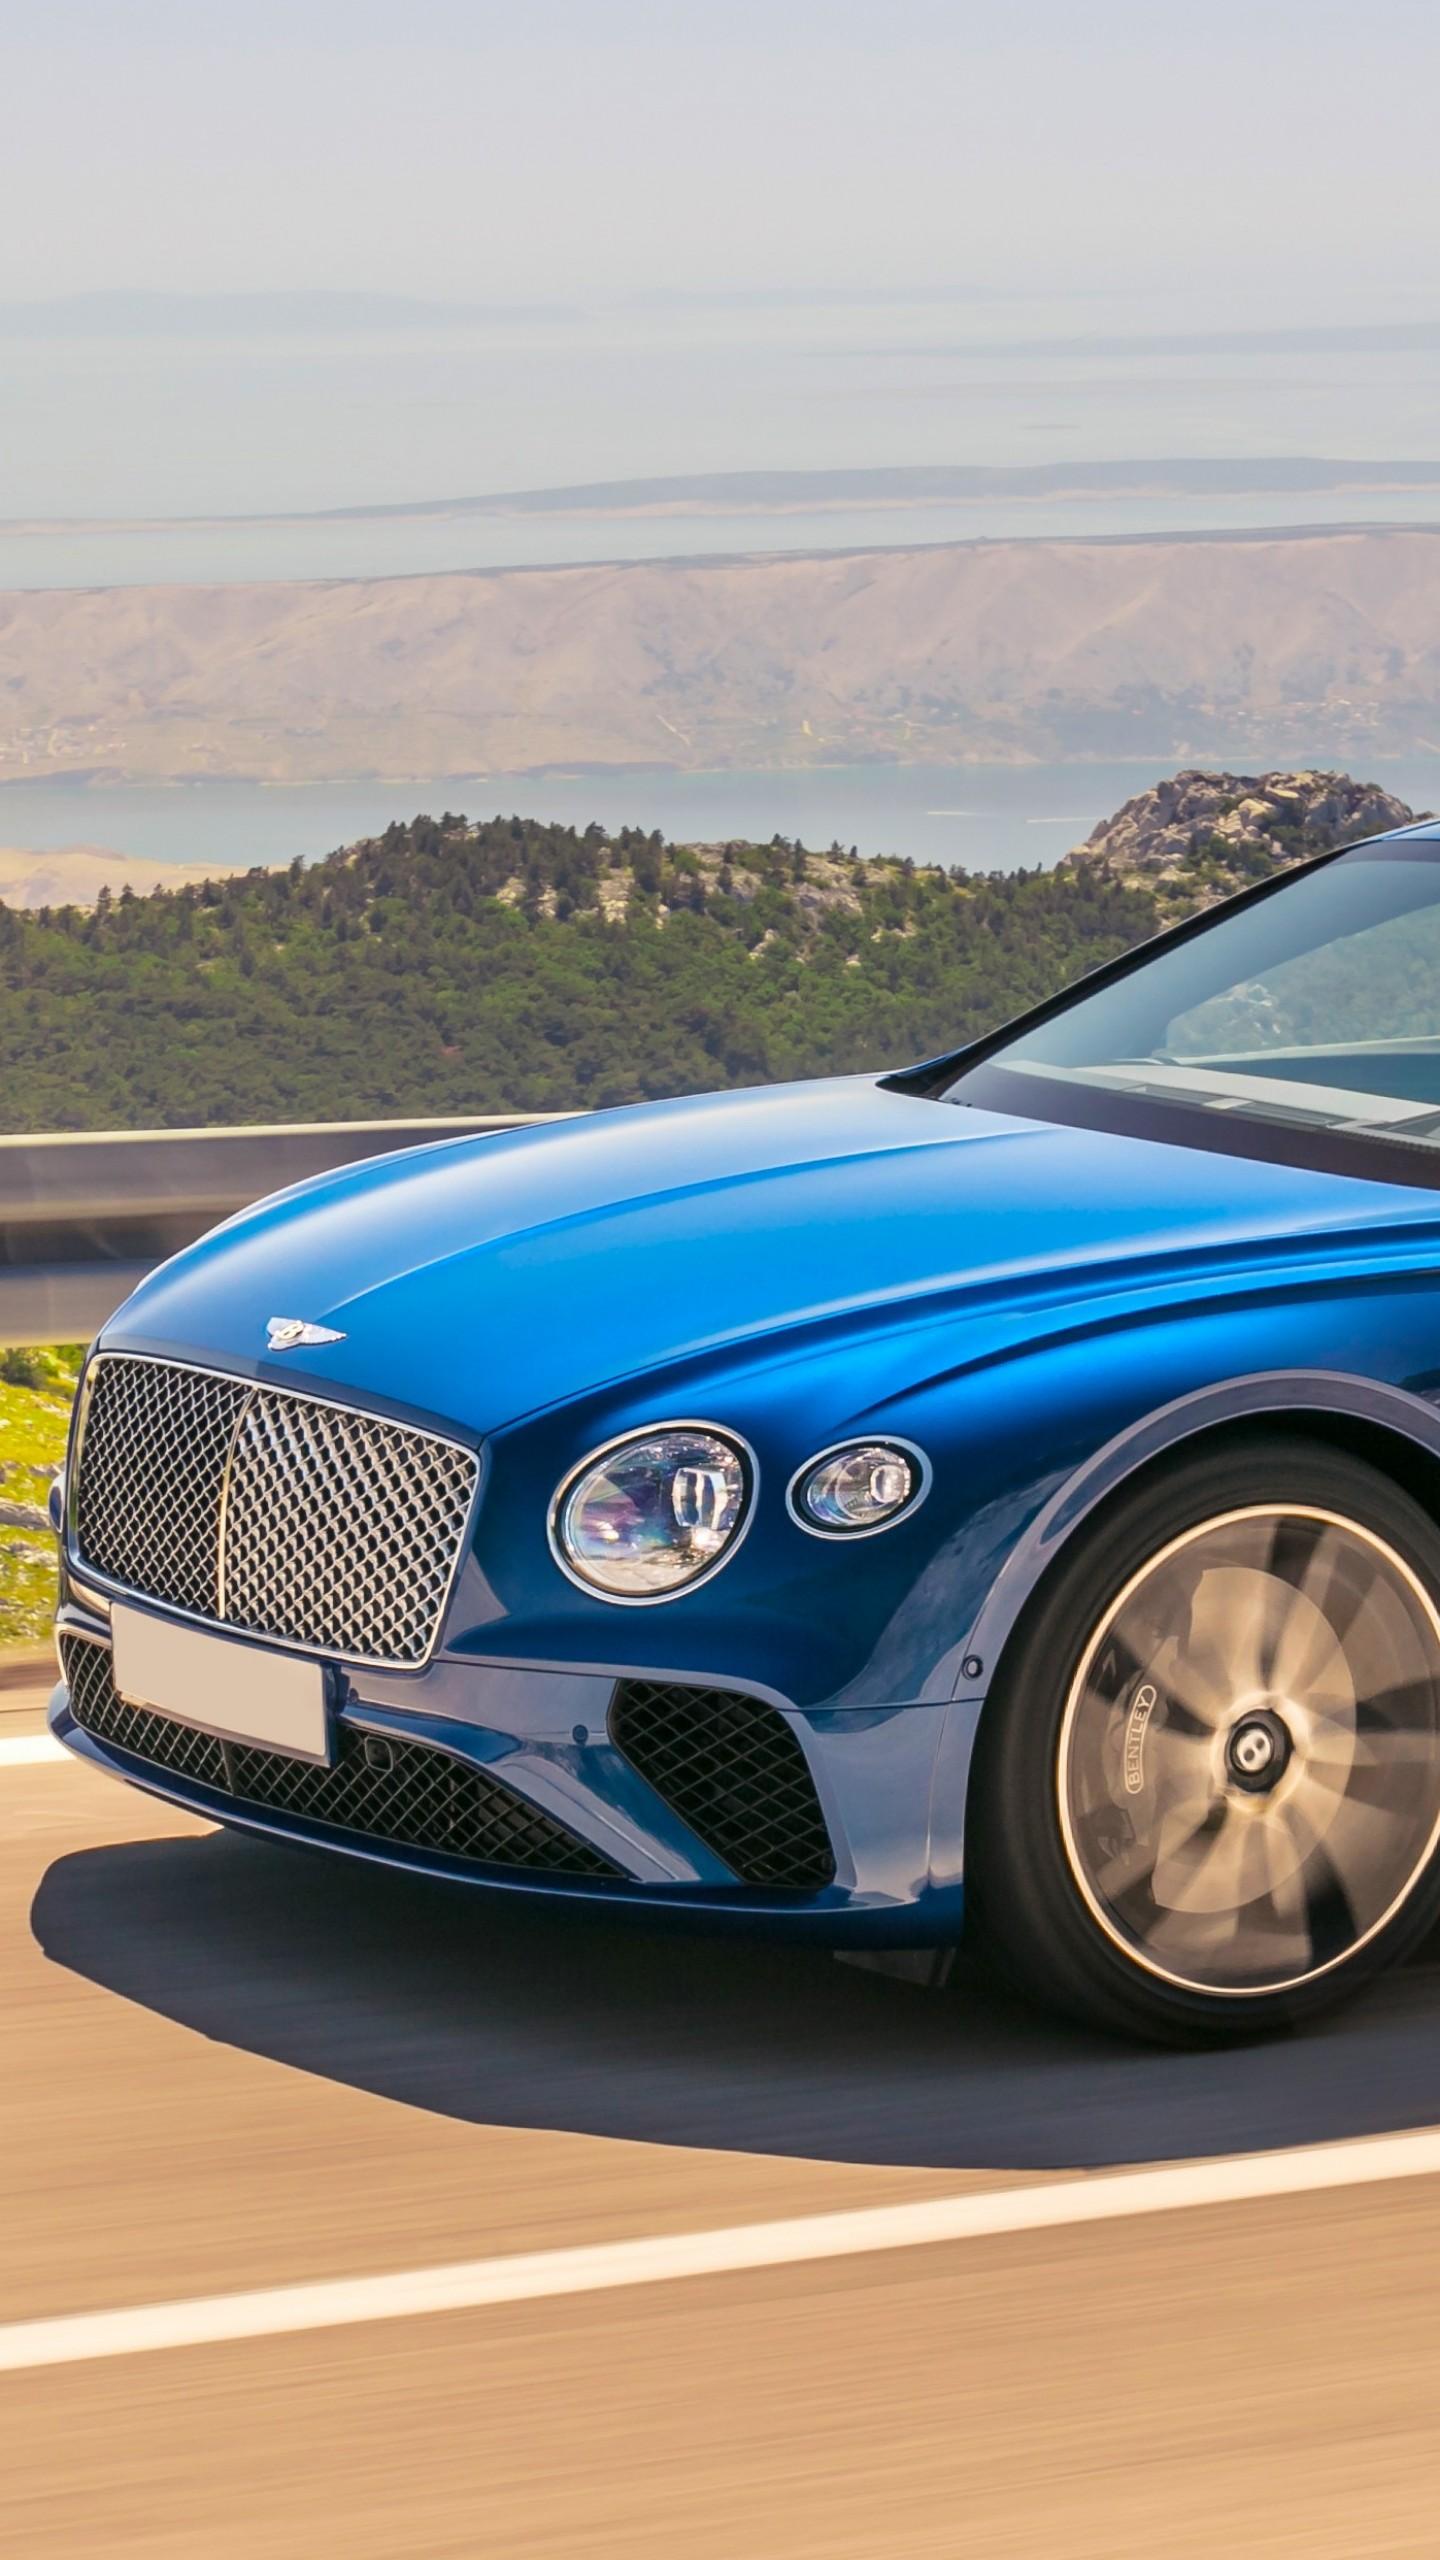 Girls Electric Car >> Wallpaper Bentley Continental GT, 2019 Cars, 5K, Cars ...